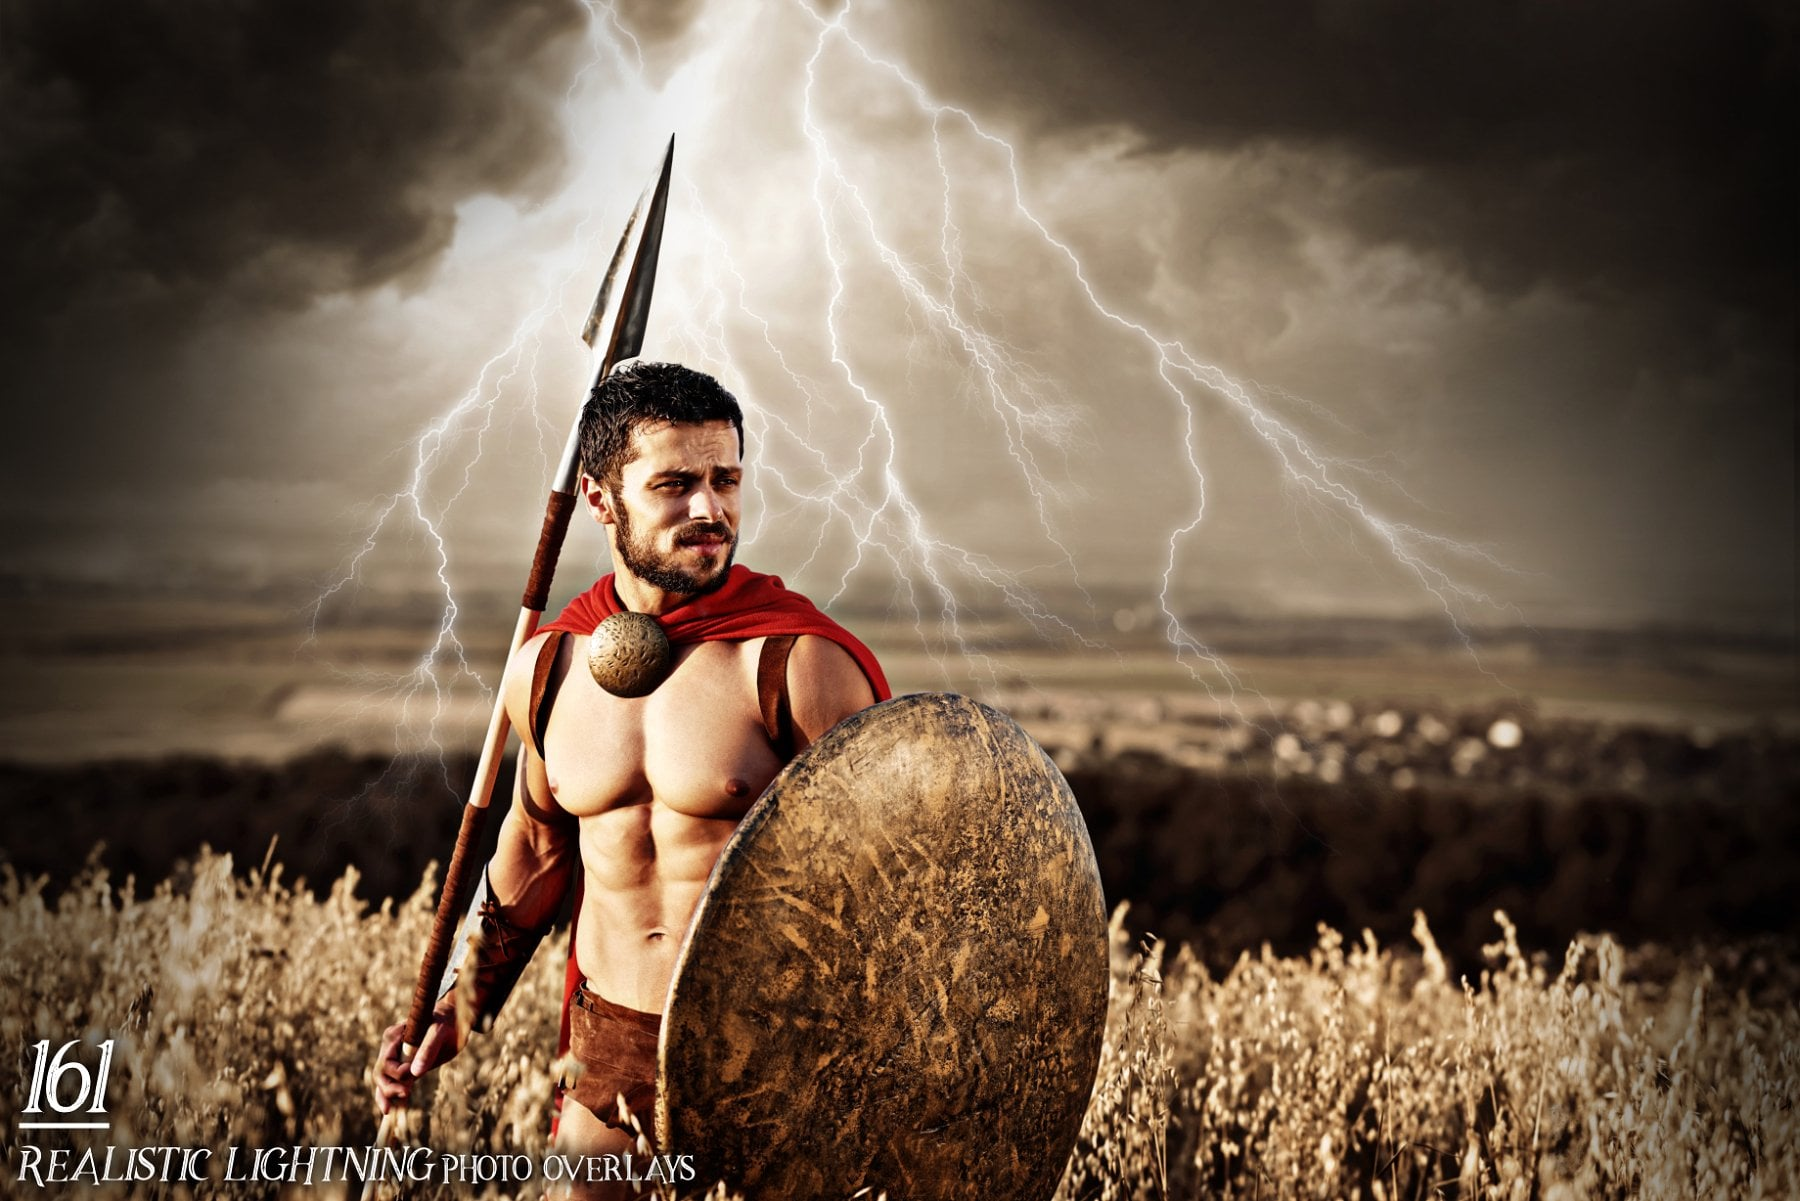 160+ Realistic Lightning Overlays - $15 - 14 min